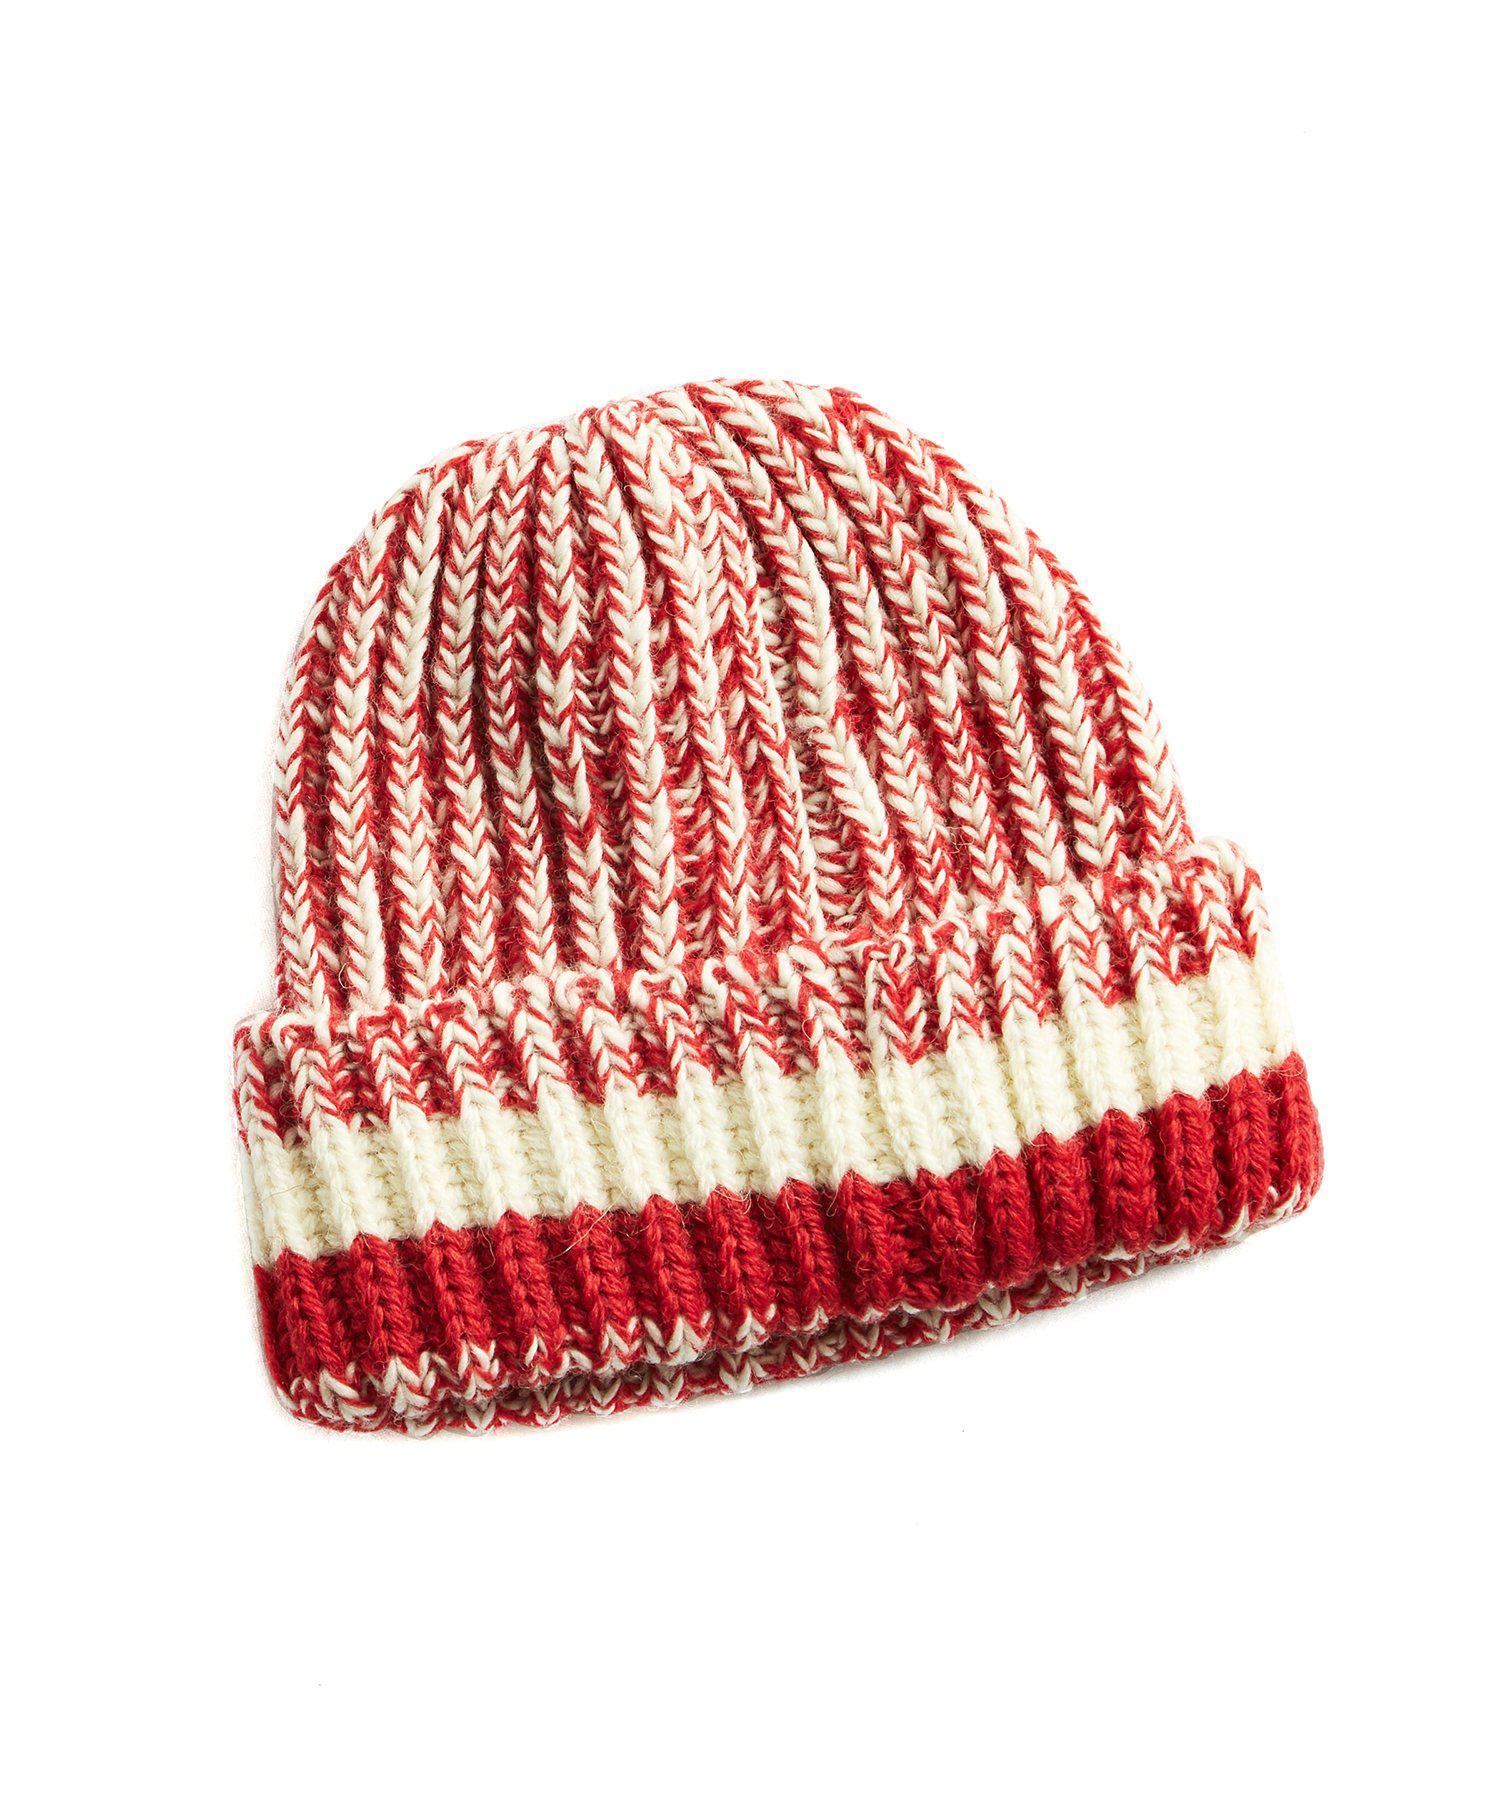 97dbef6b13c Drake S Slub Bob Cap In Red in Red for Men - Lyst